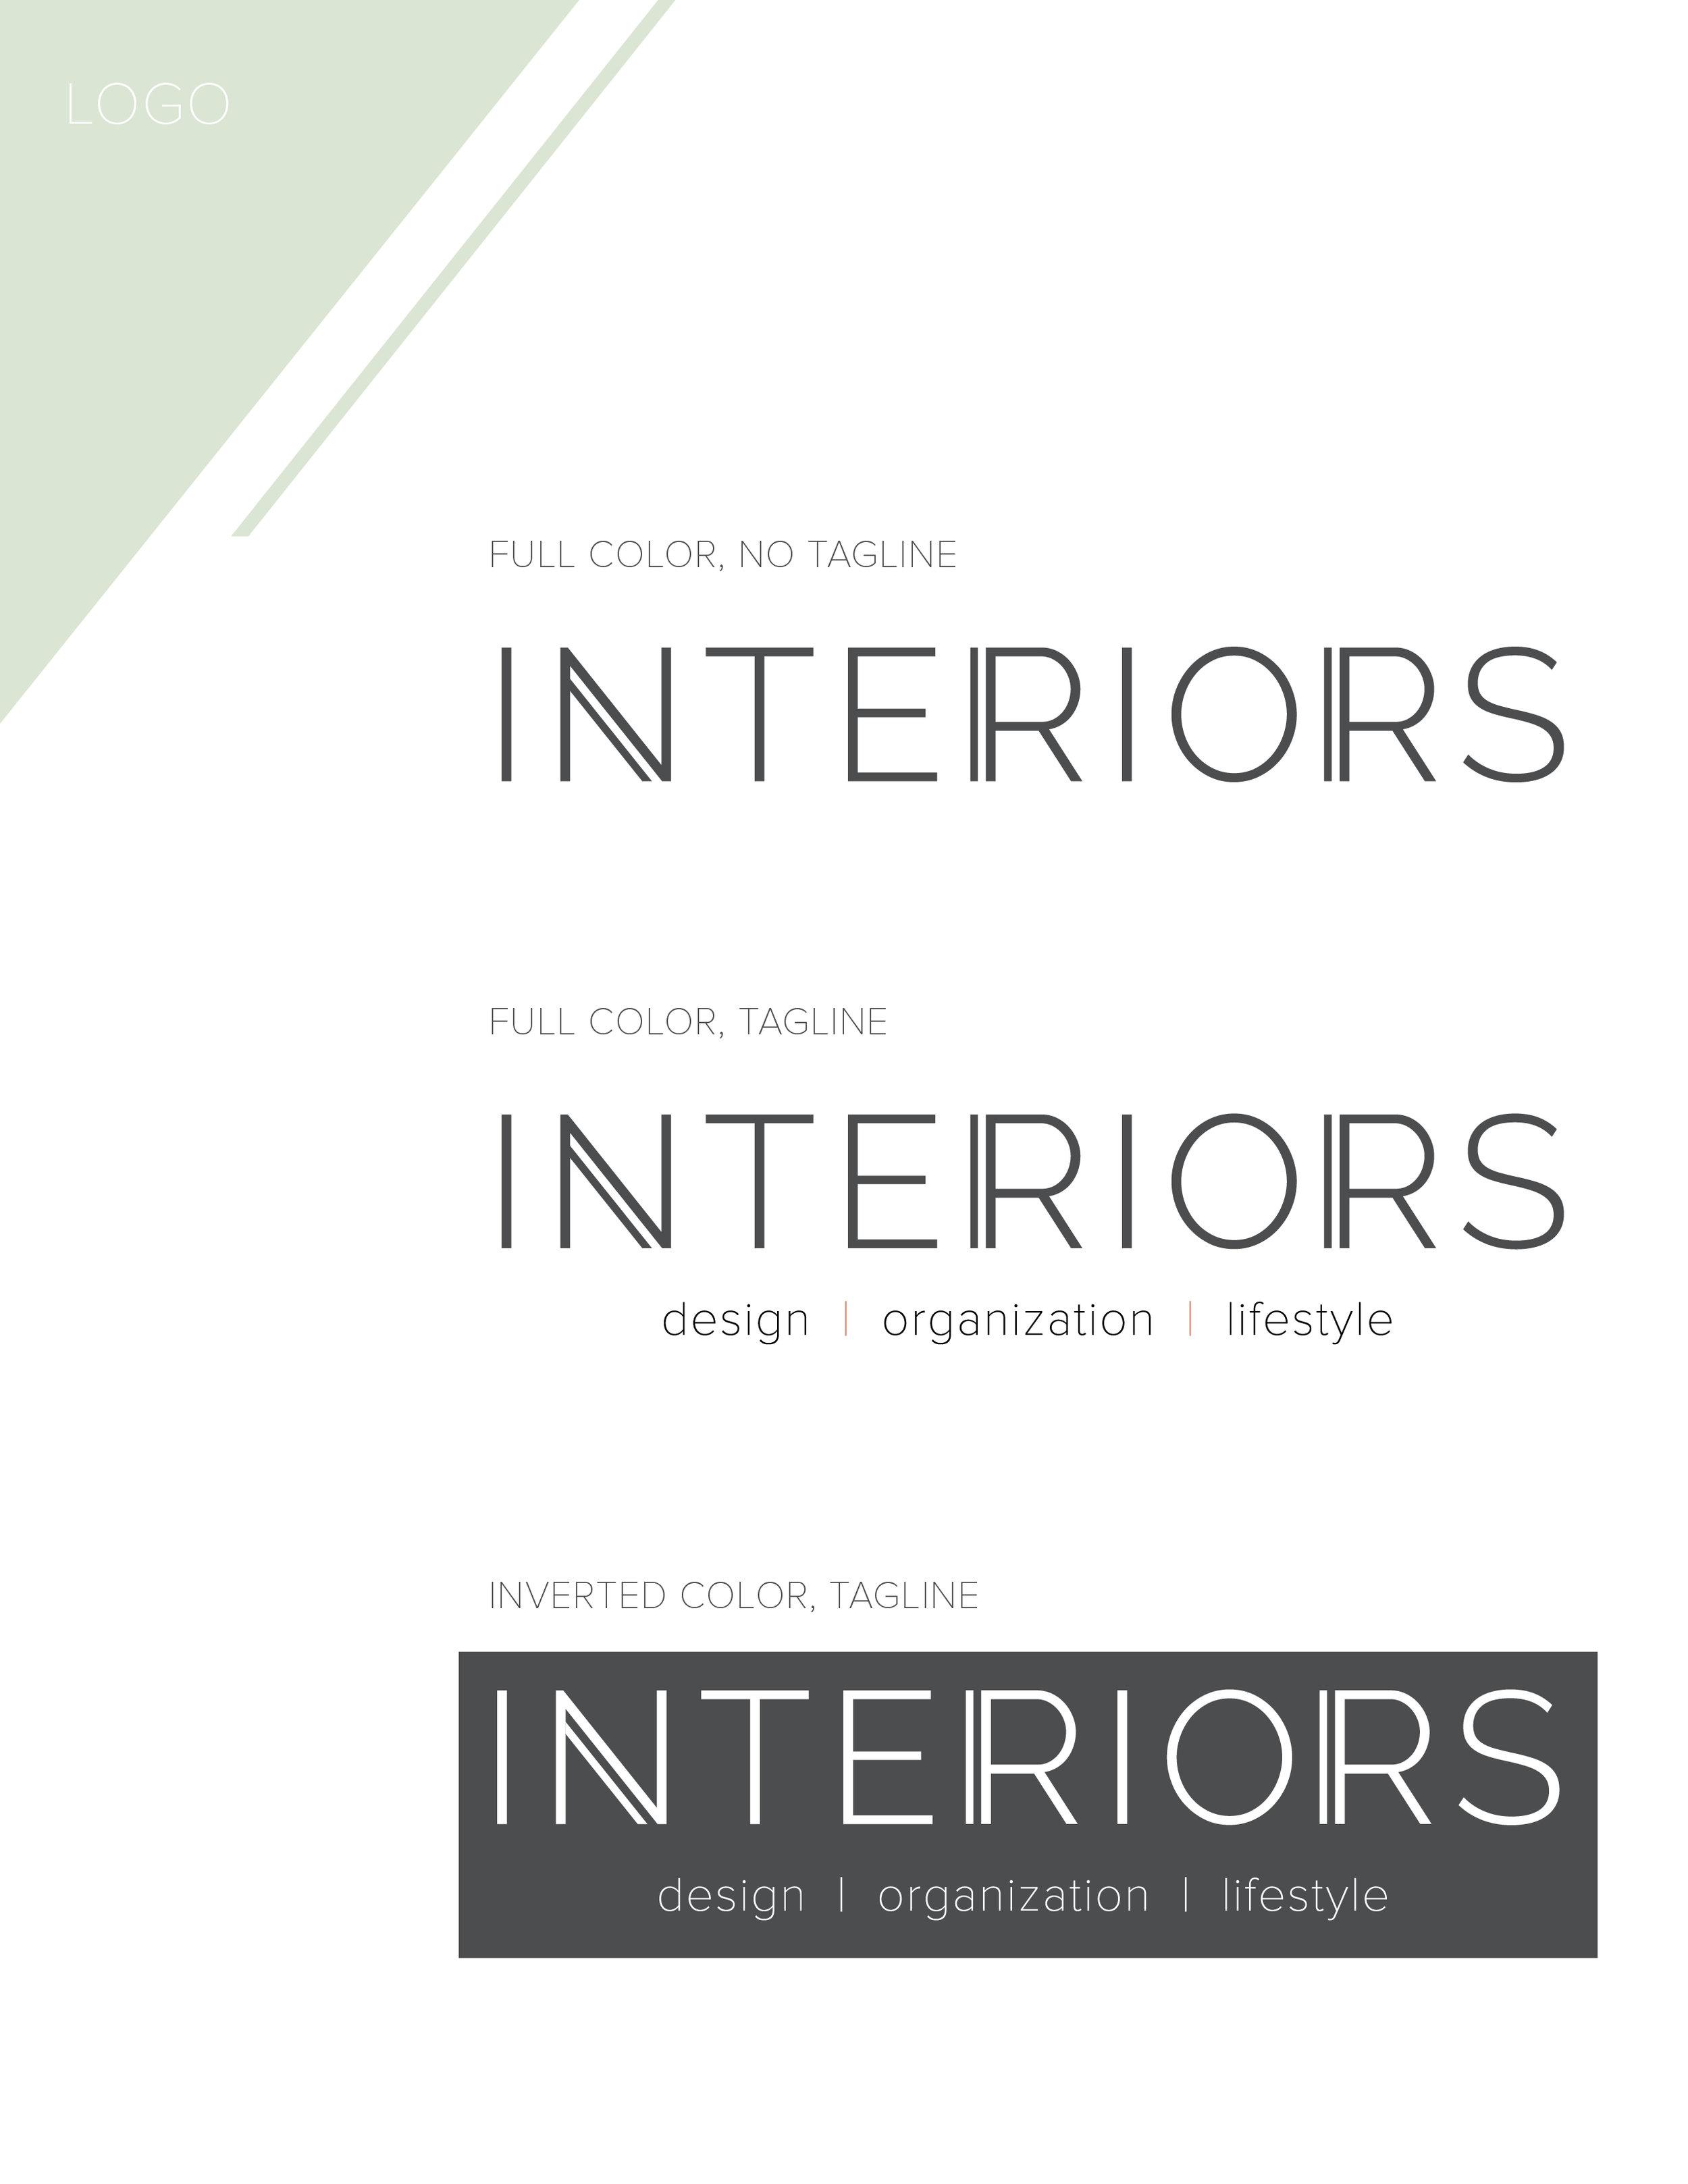 Interiors_BrandStyleGuide-03.jpg